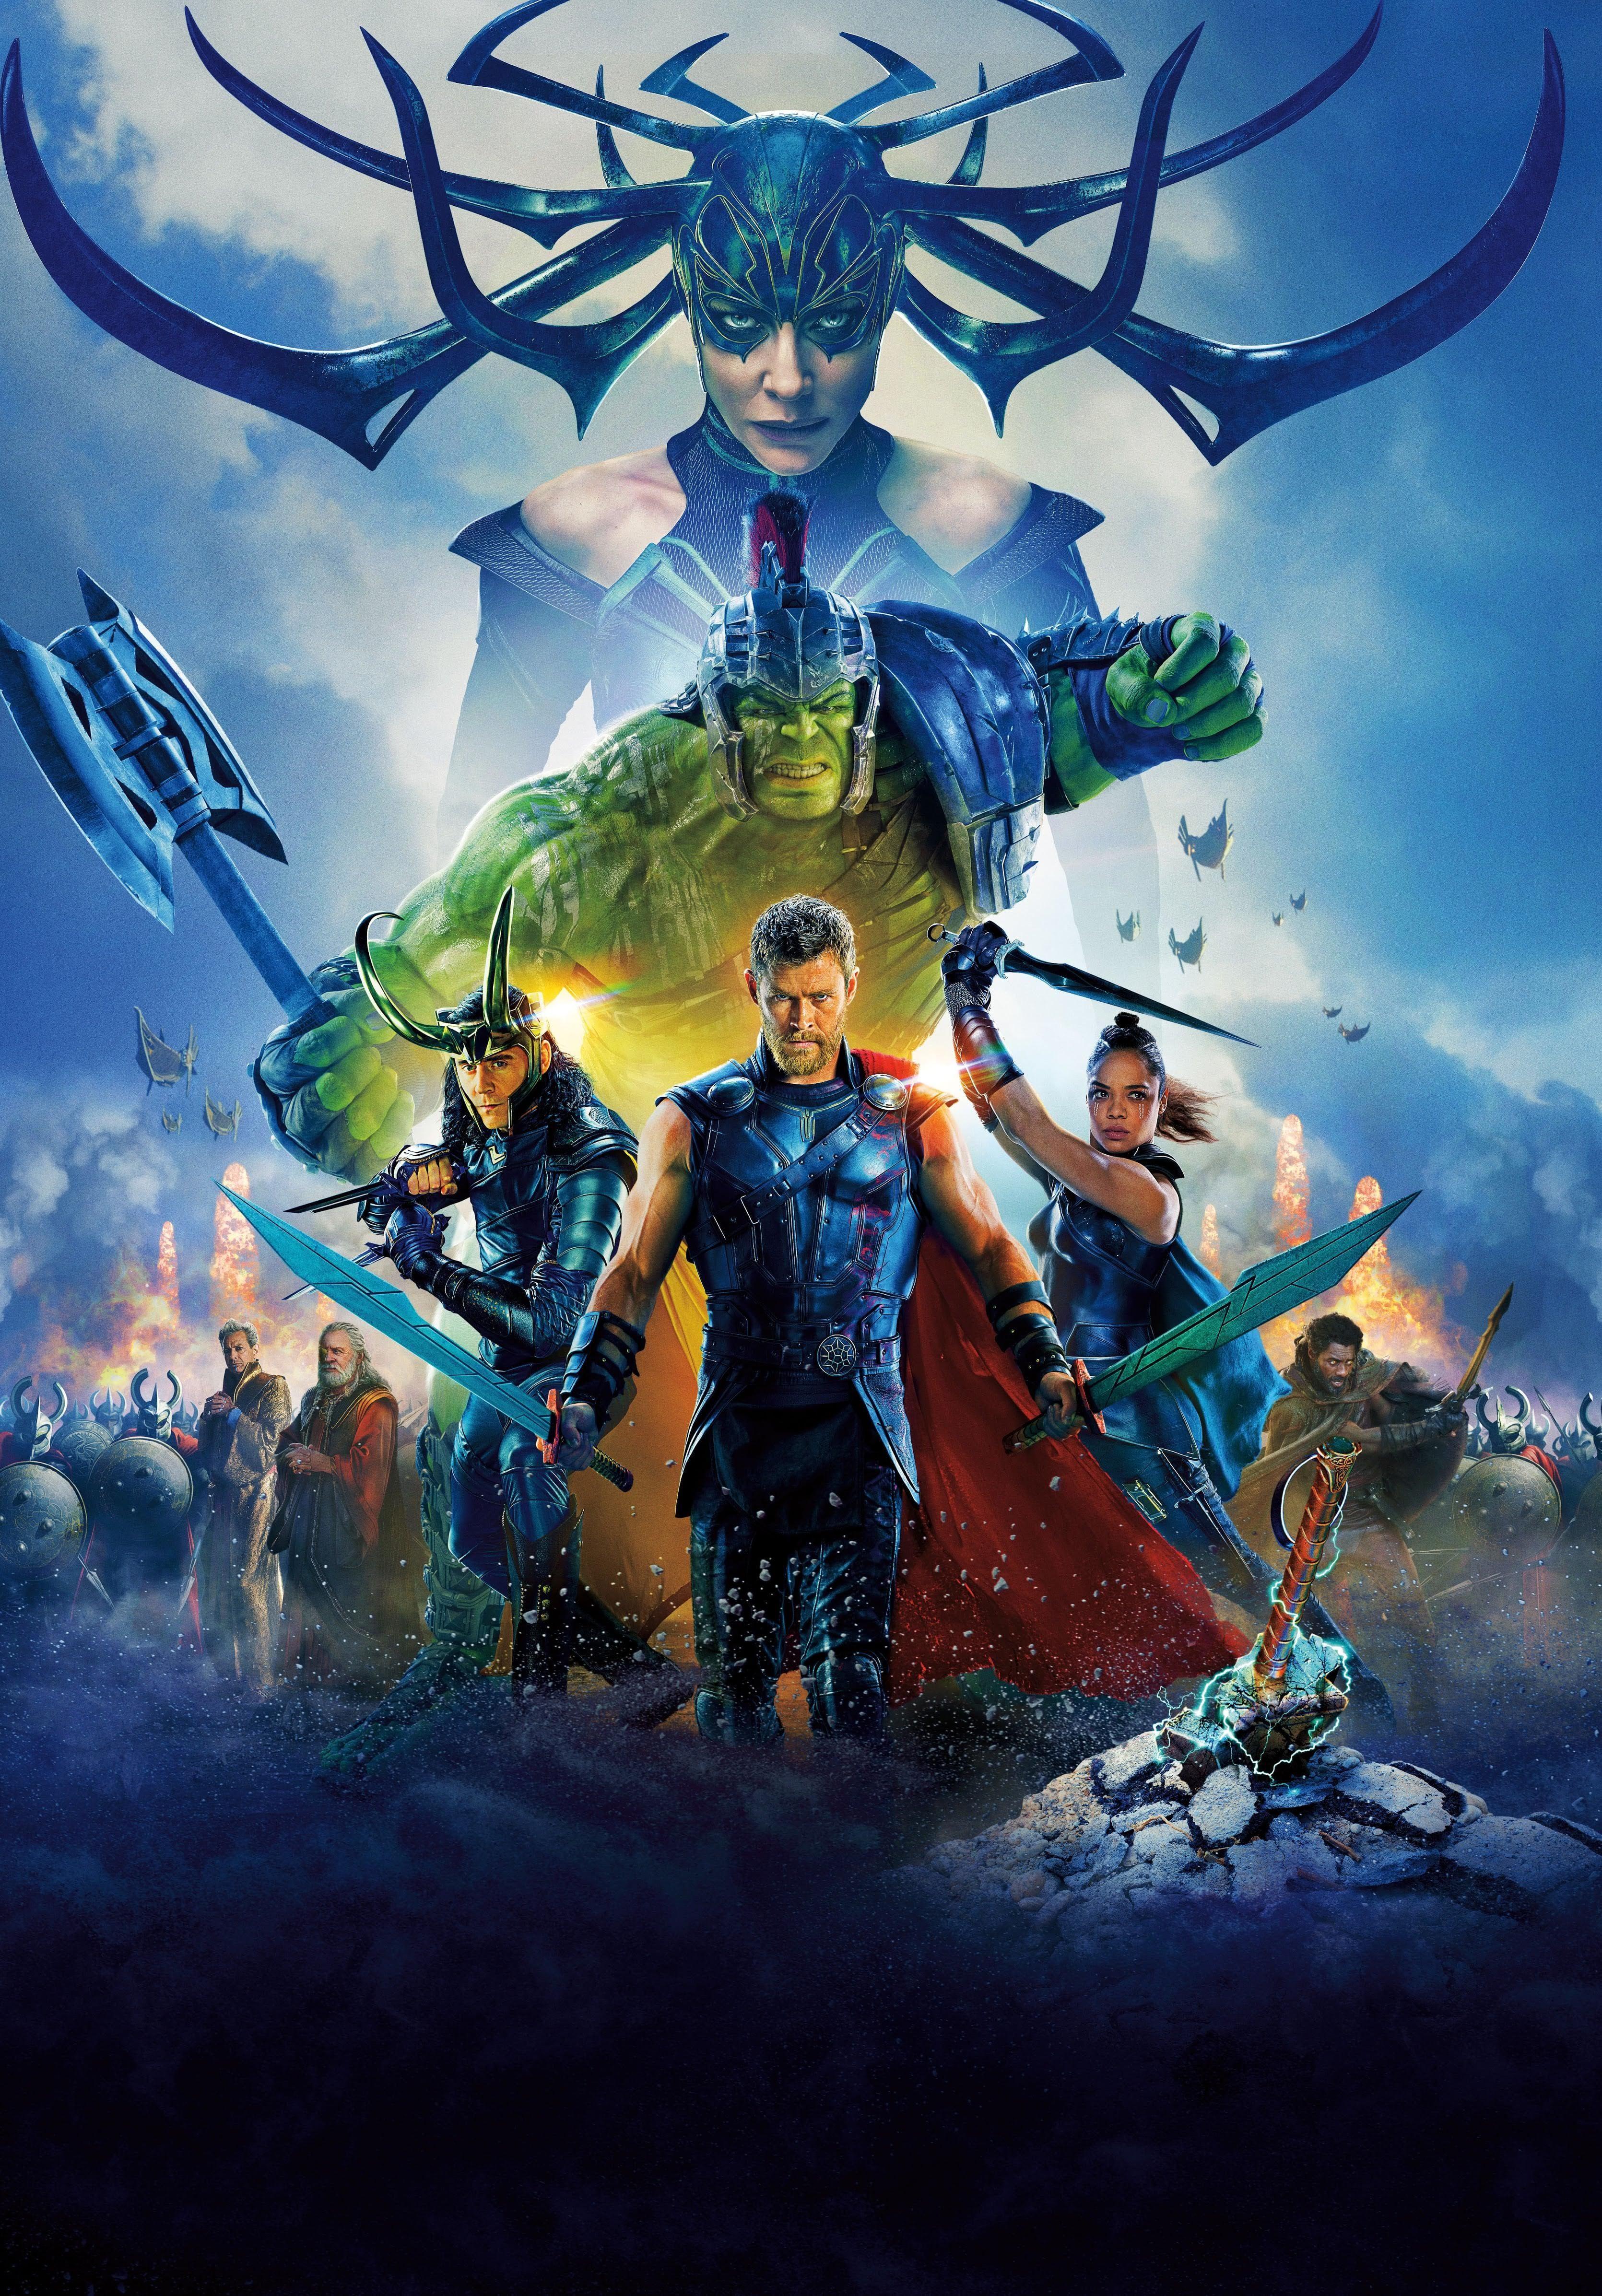 Thor 4 大友ファンとマーベル・ファンに朗報 ! !、ハリウッド版実写映画「AKIRA/アキラ」の製作が延期に